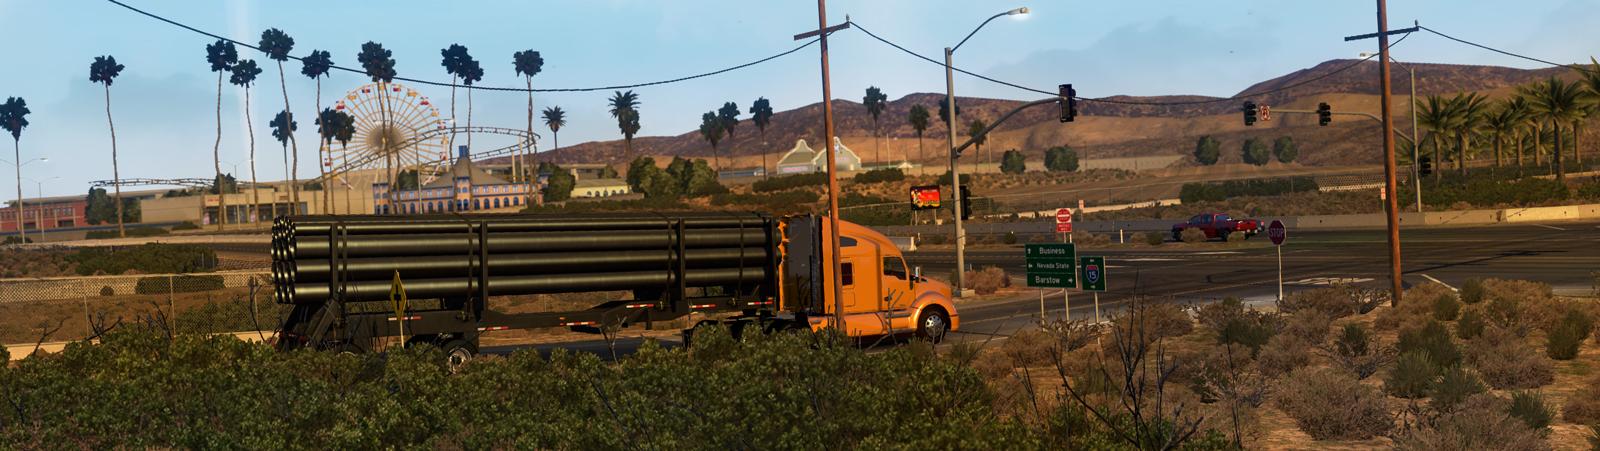 Rozhovor s SCS Software nejen o American Truck Simulatoru 101523